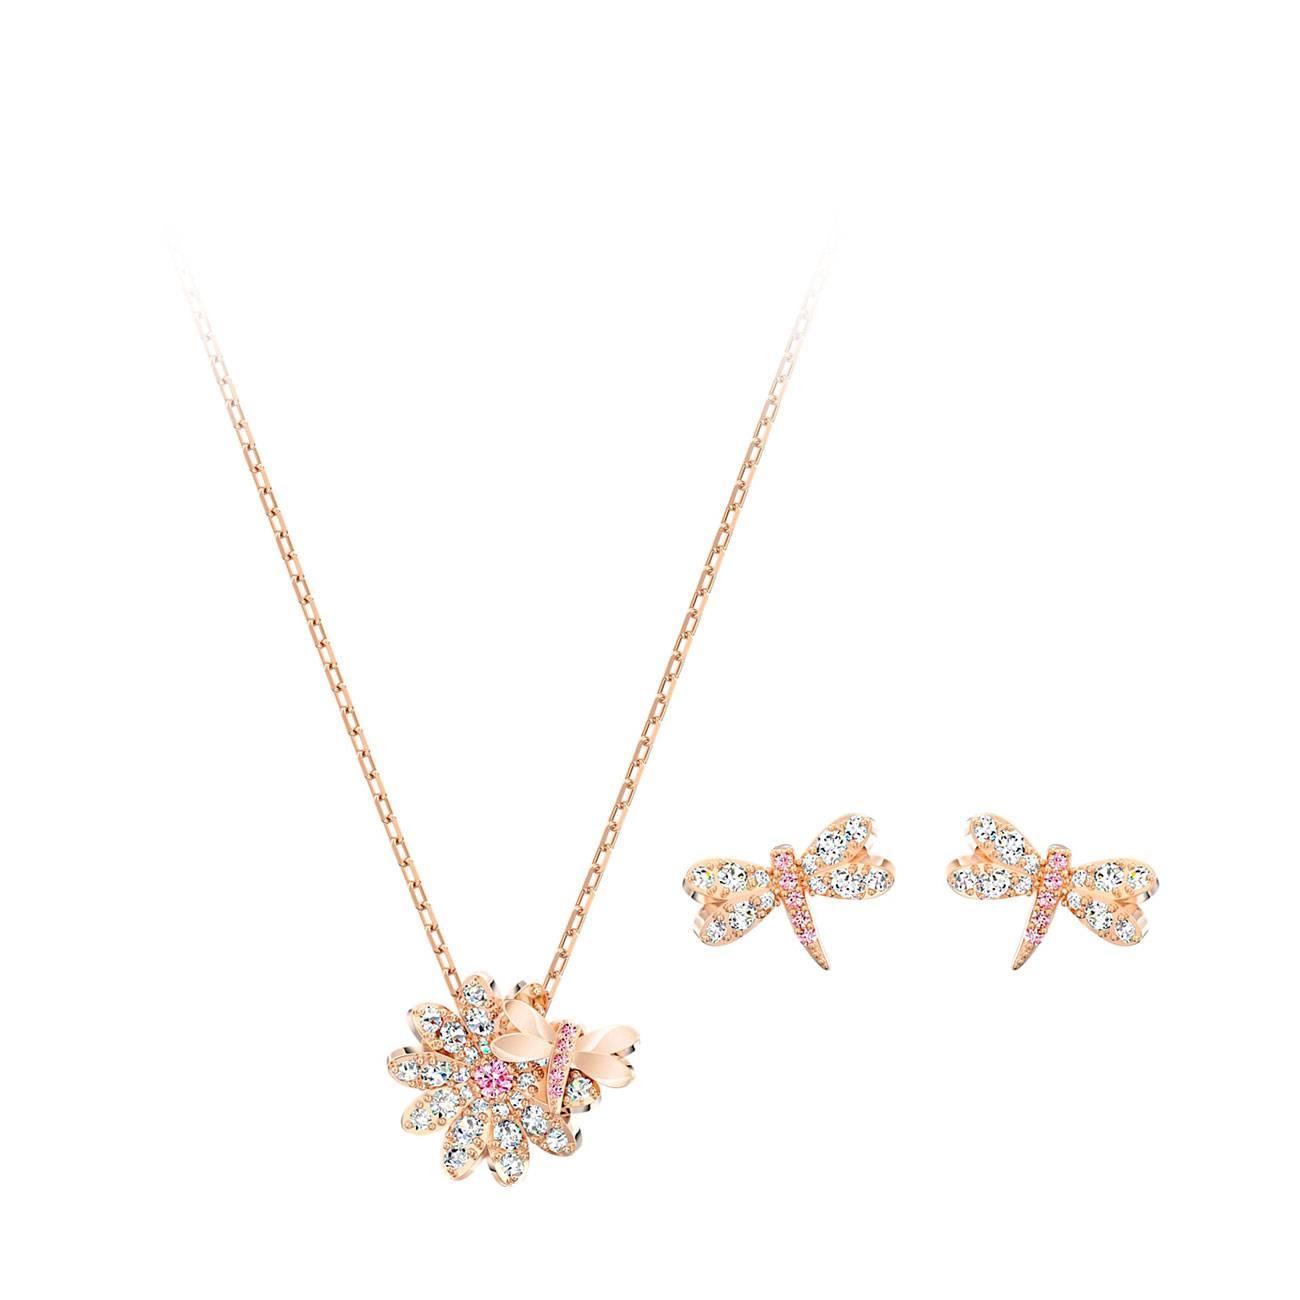 ETERNAL FLOWER DRAGONFLY SET 5518141 imagine produs